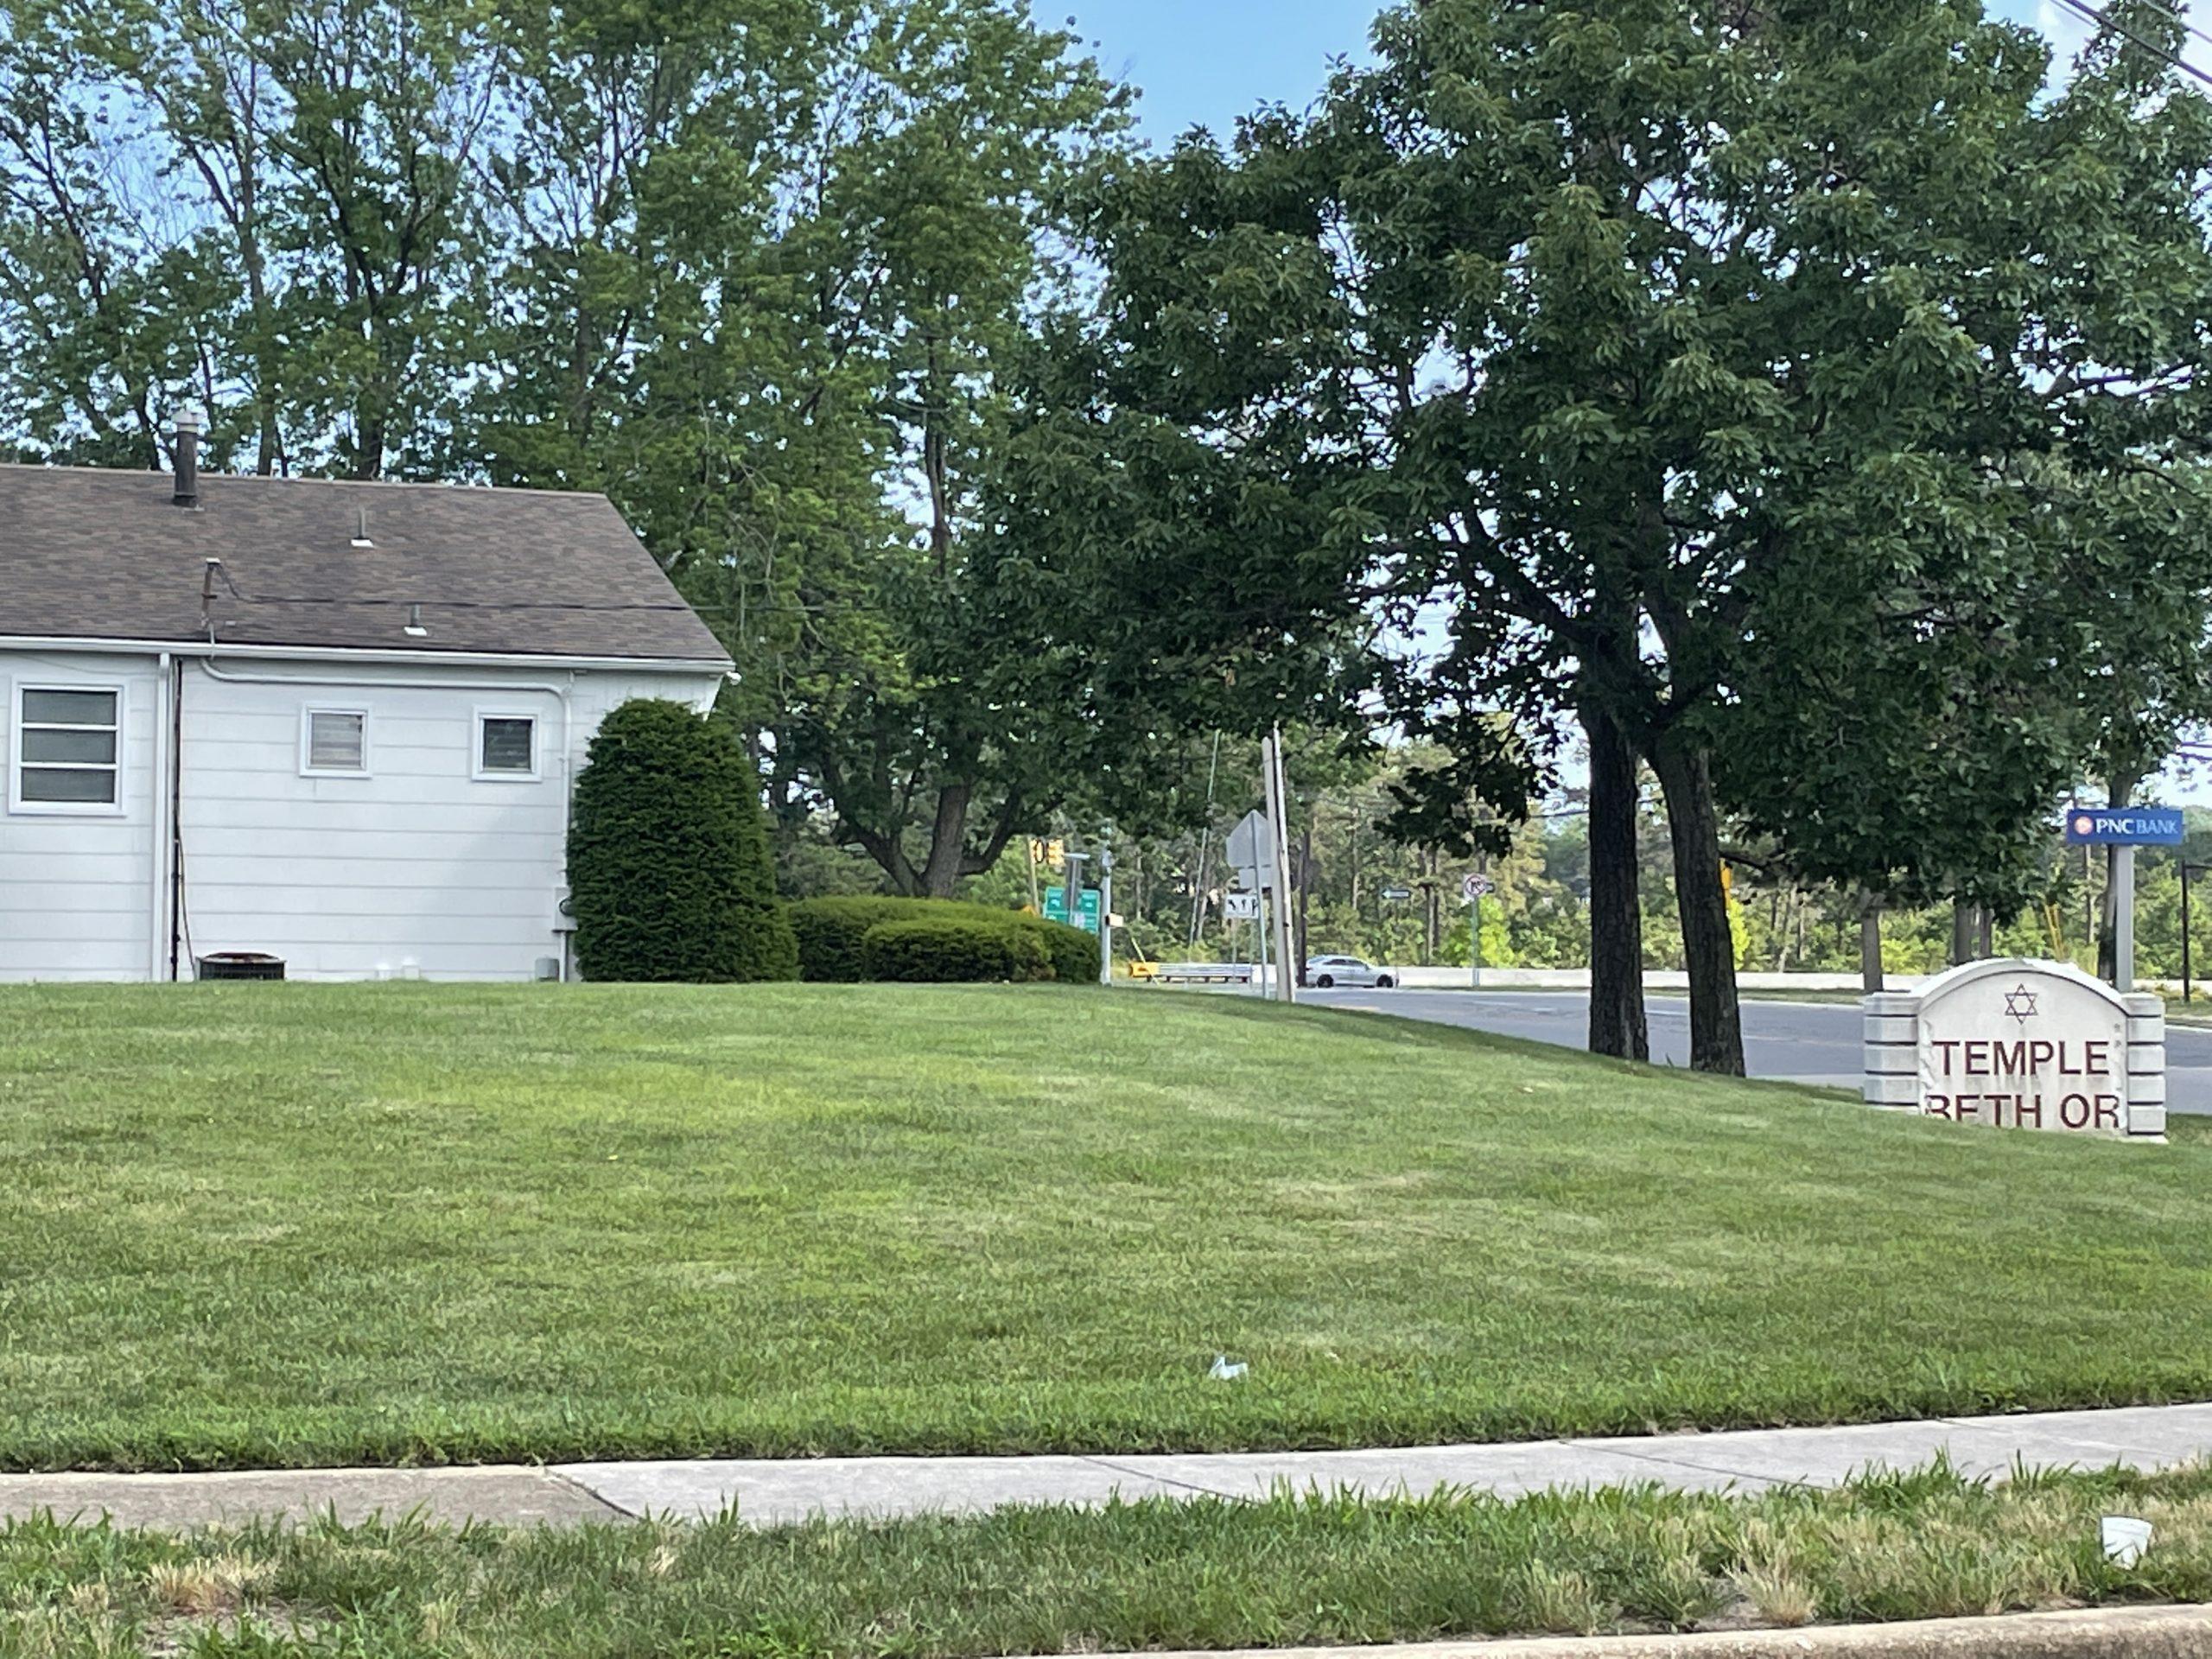 The former Temple Beth Or property, Brick, N.J., June 2021. (Photo: Daniel Nee)